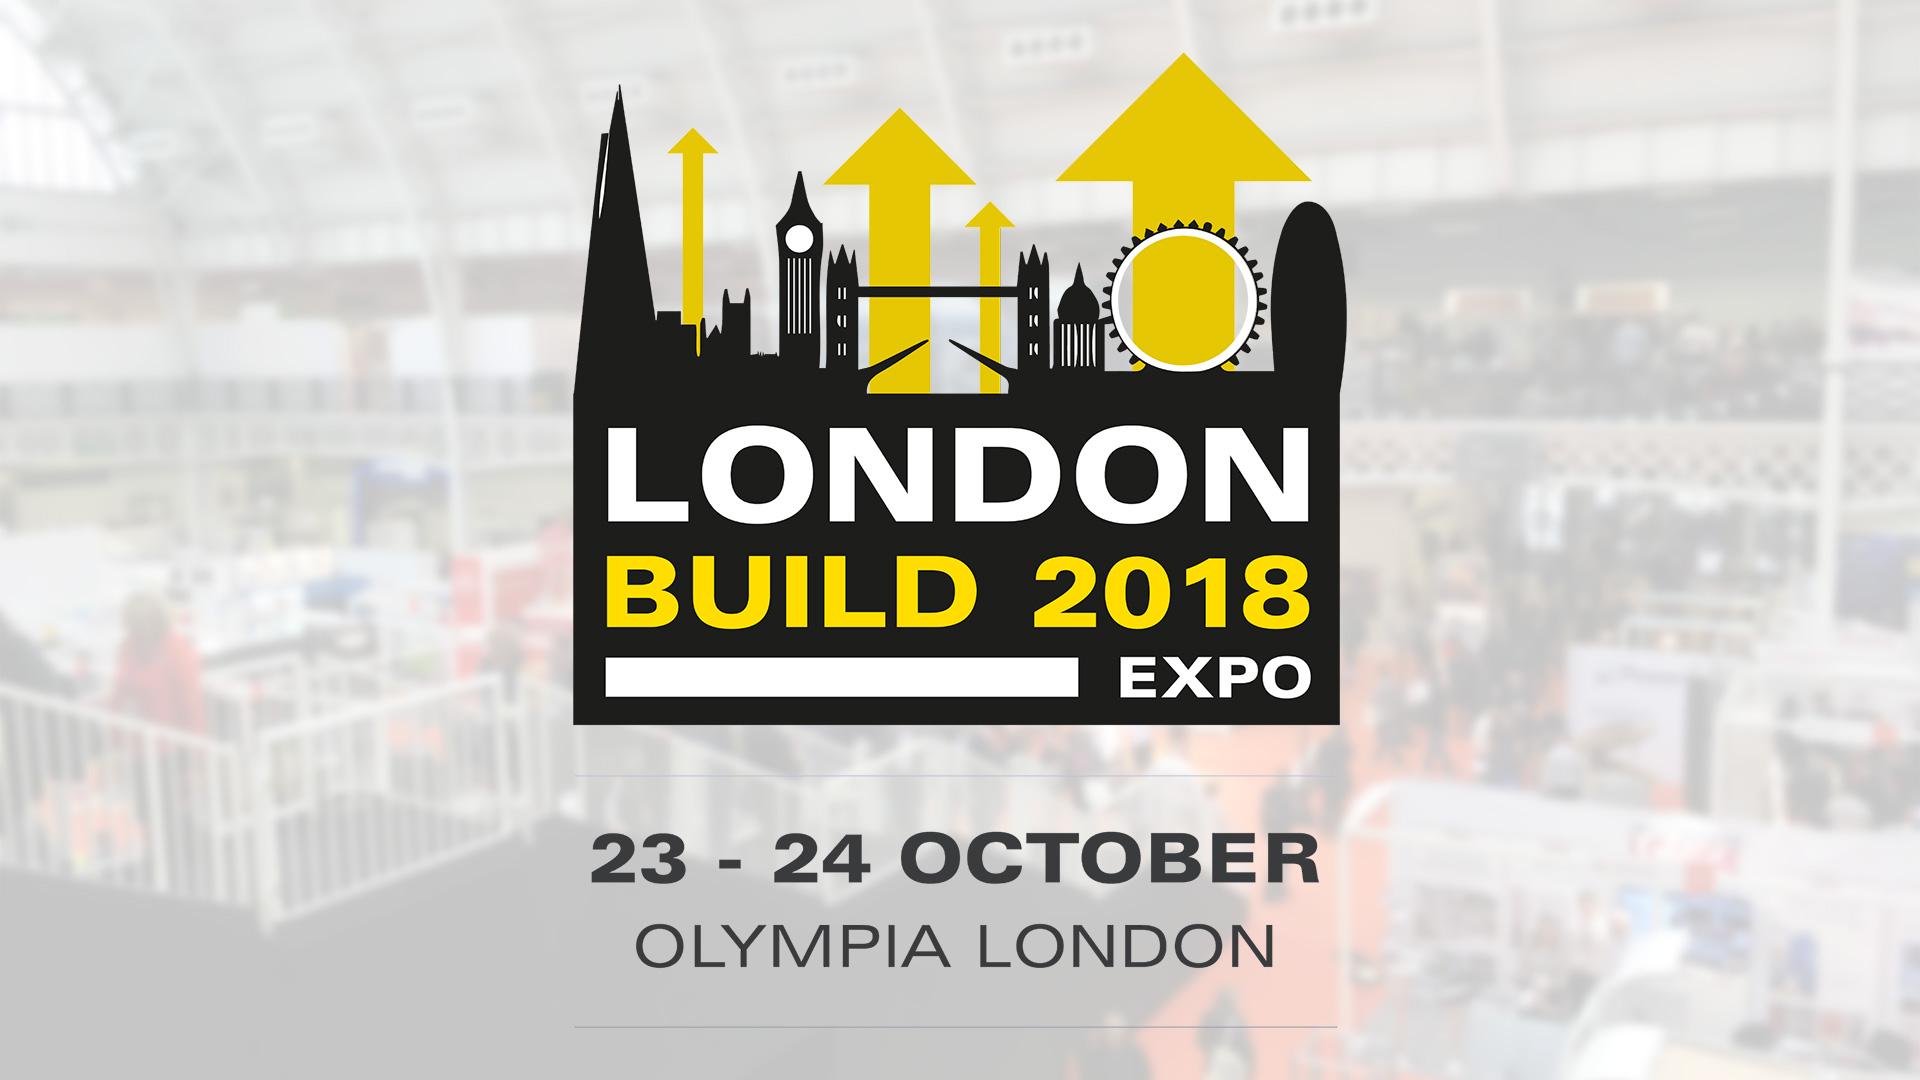 London Build 2018